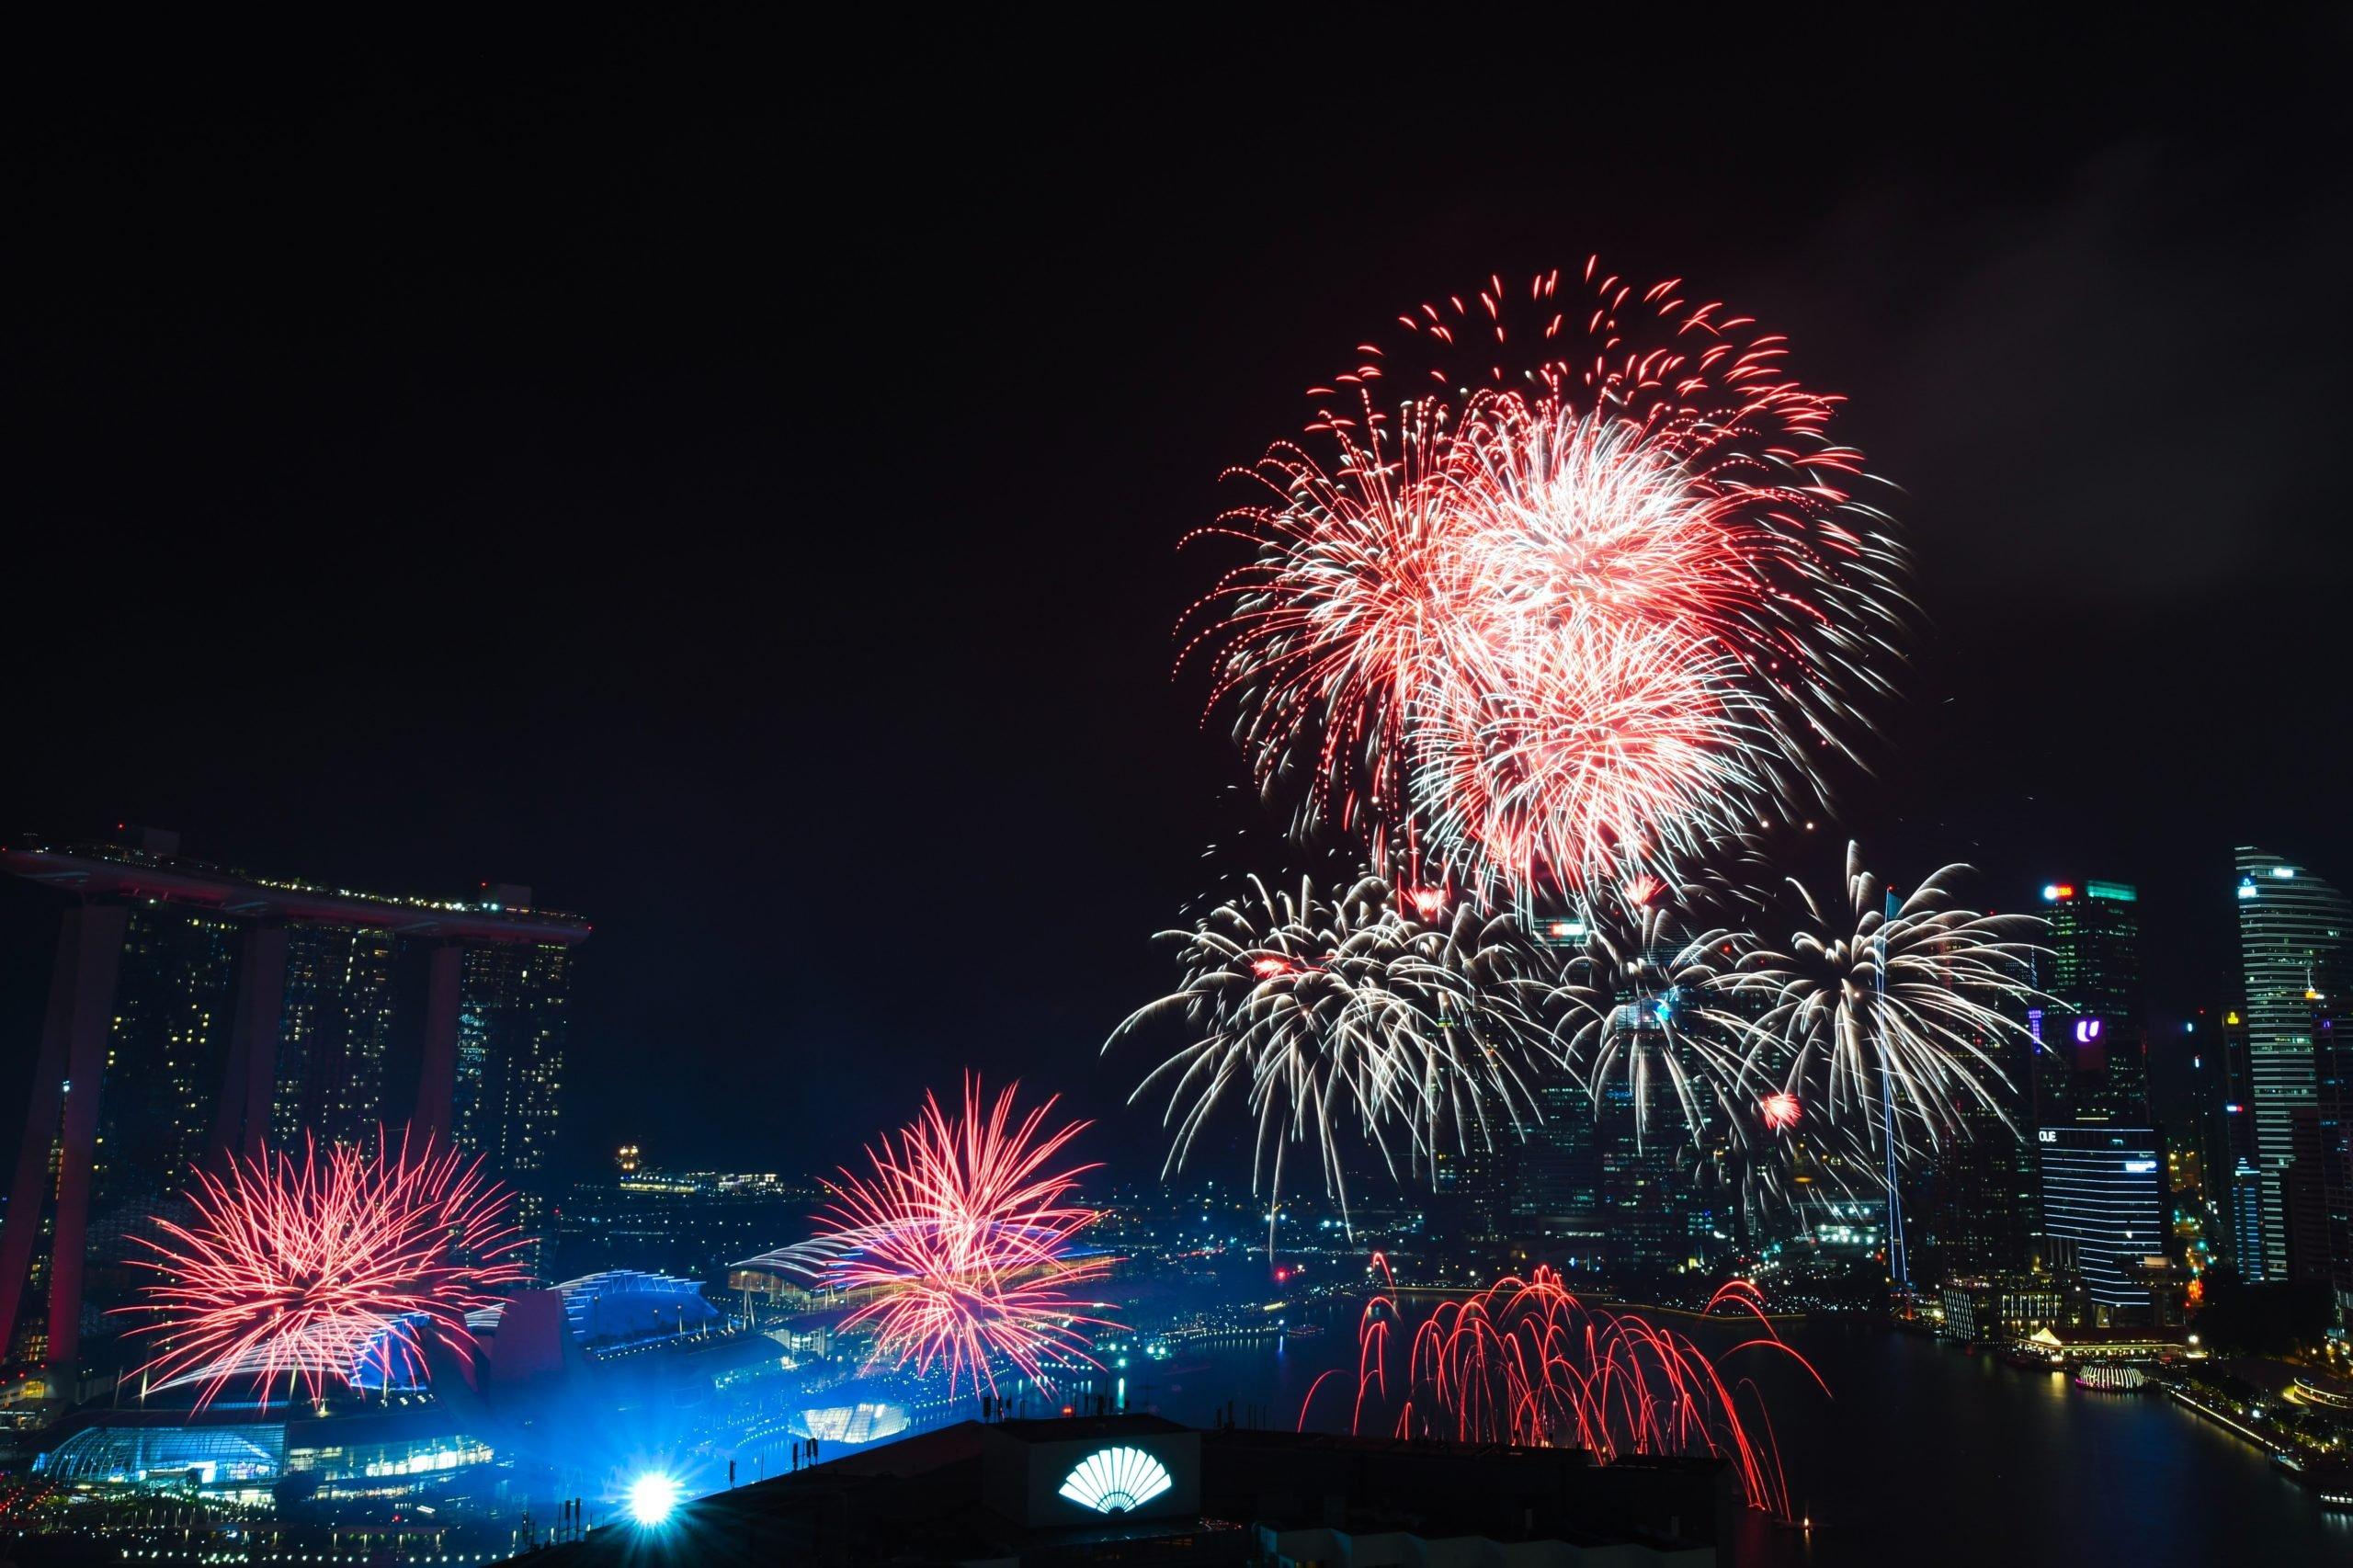 Fireworks venues